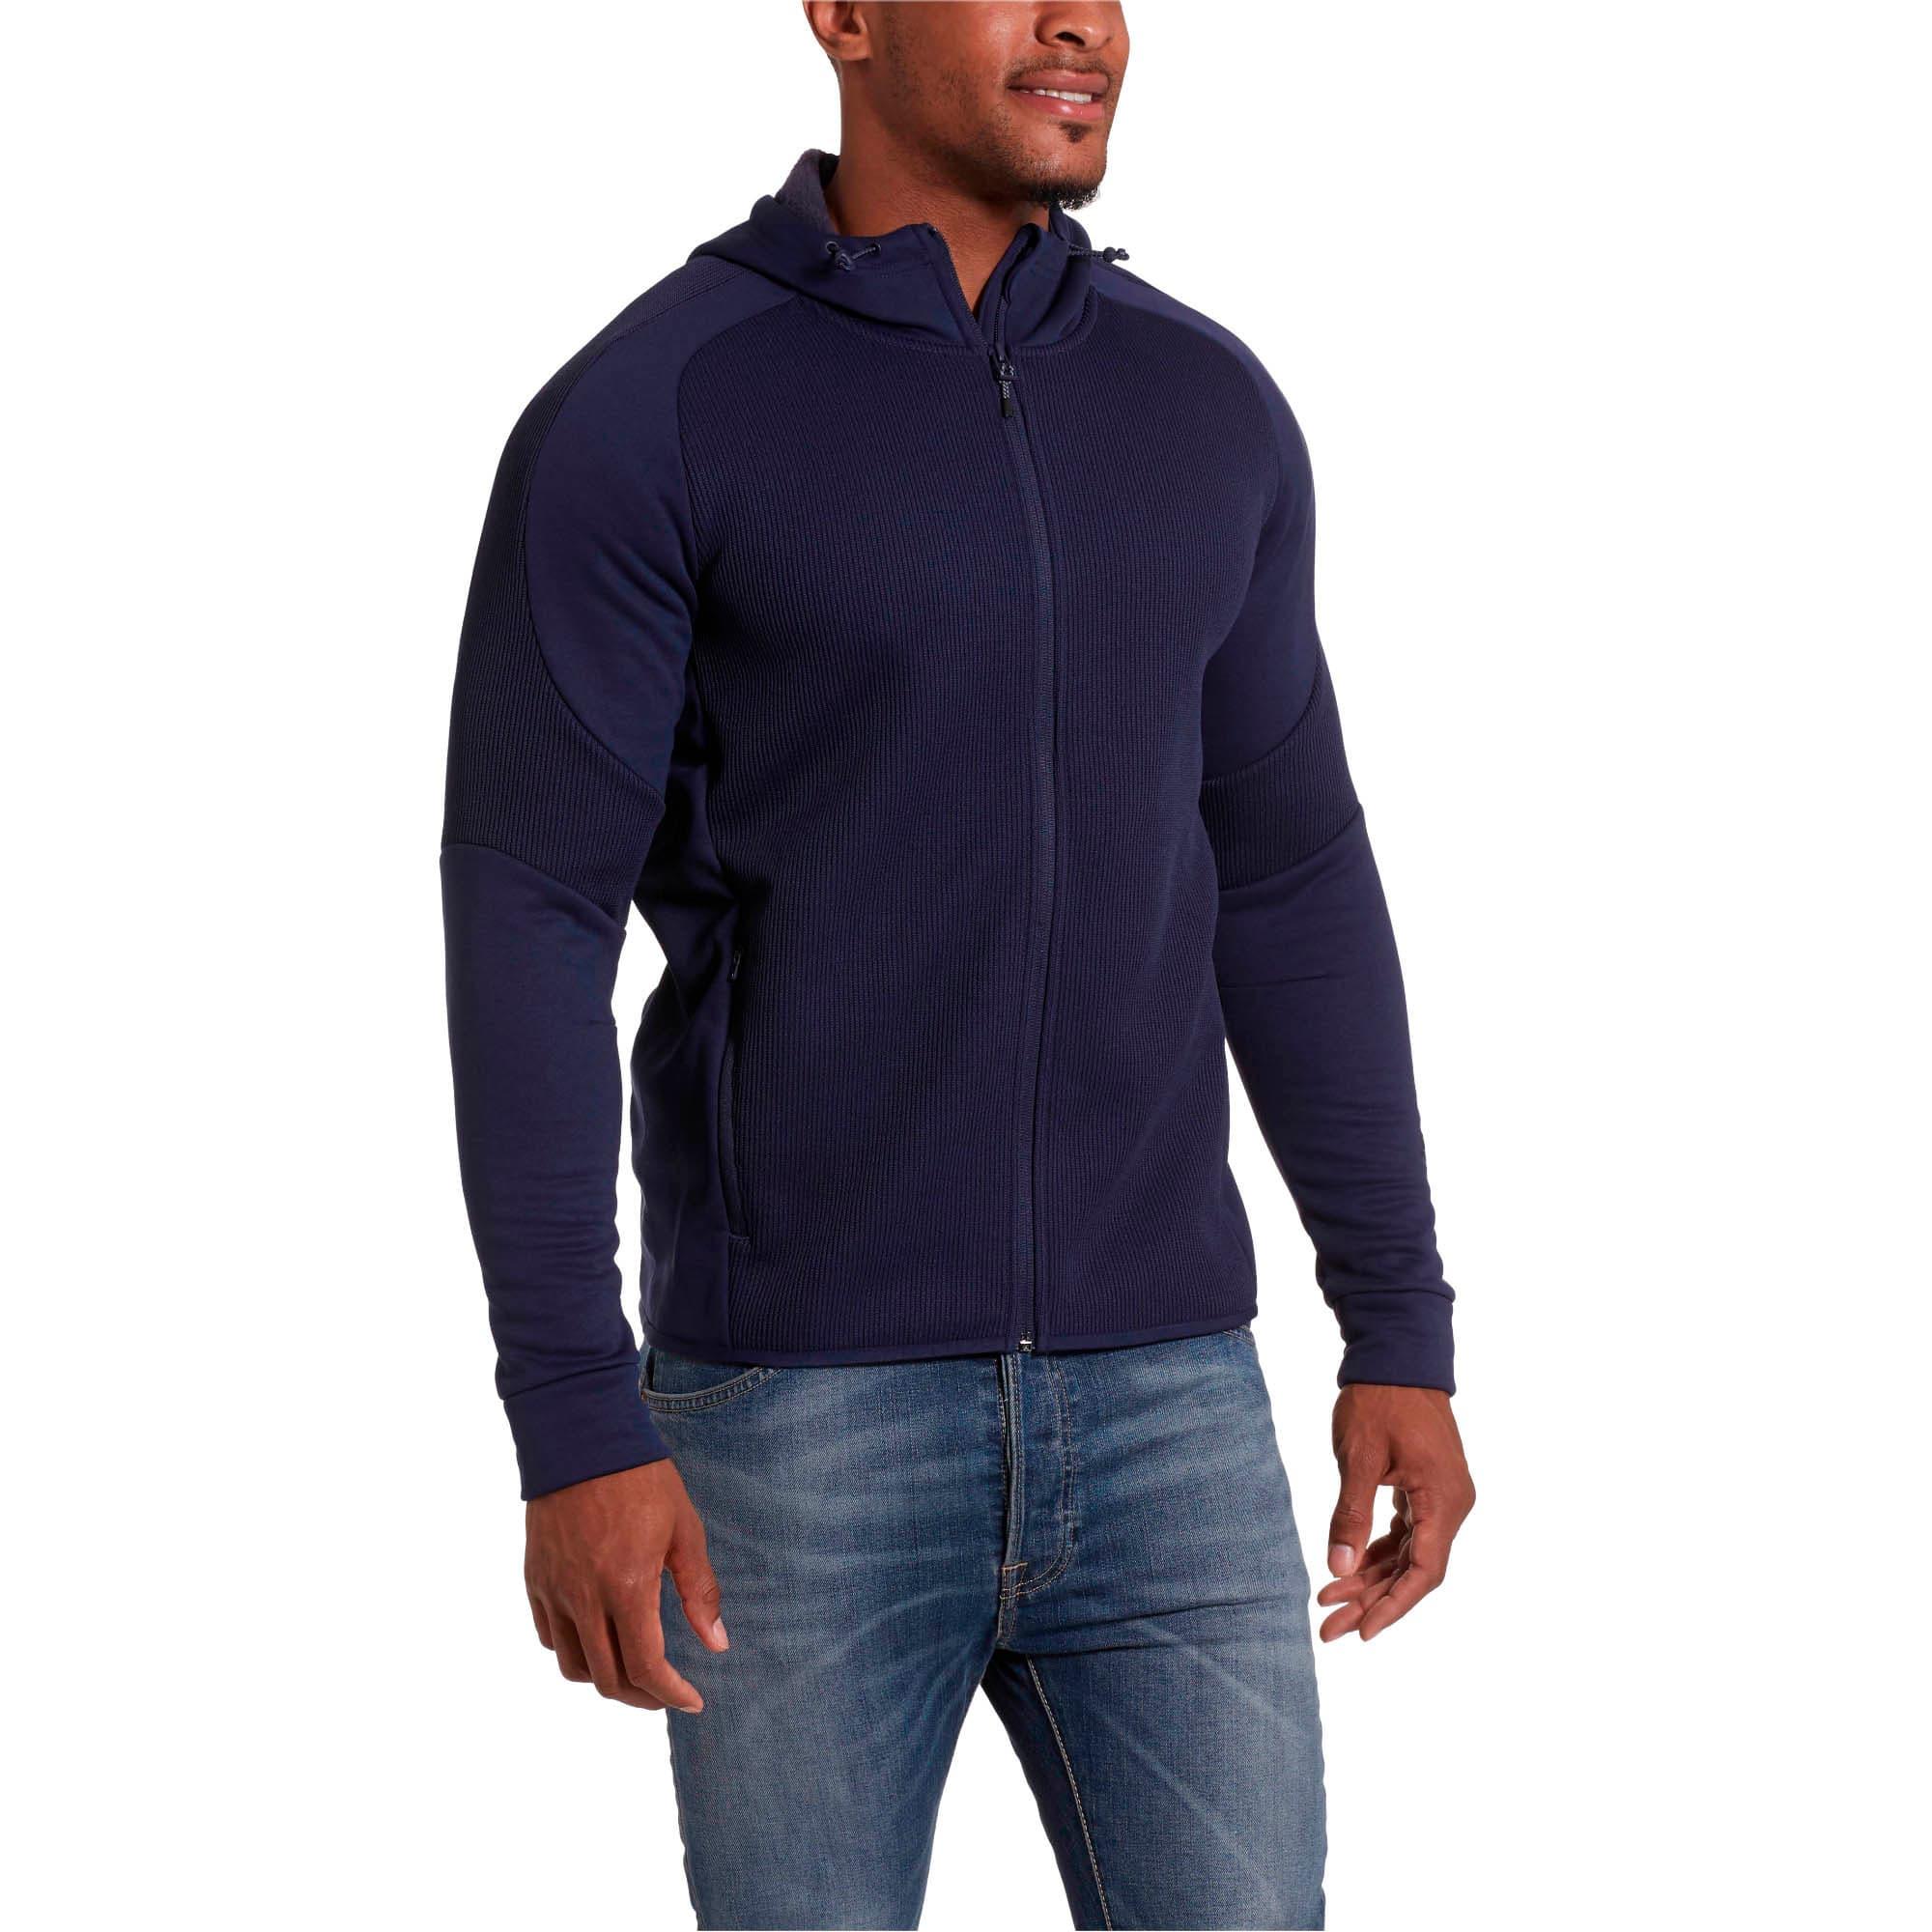 Thumbnail 2 of EVOstripe Hybrid Men's Hooded Jacket, Peacoat, medium